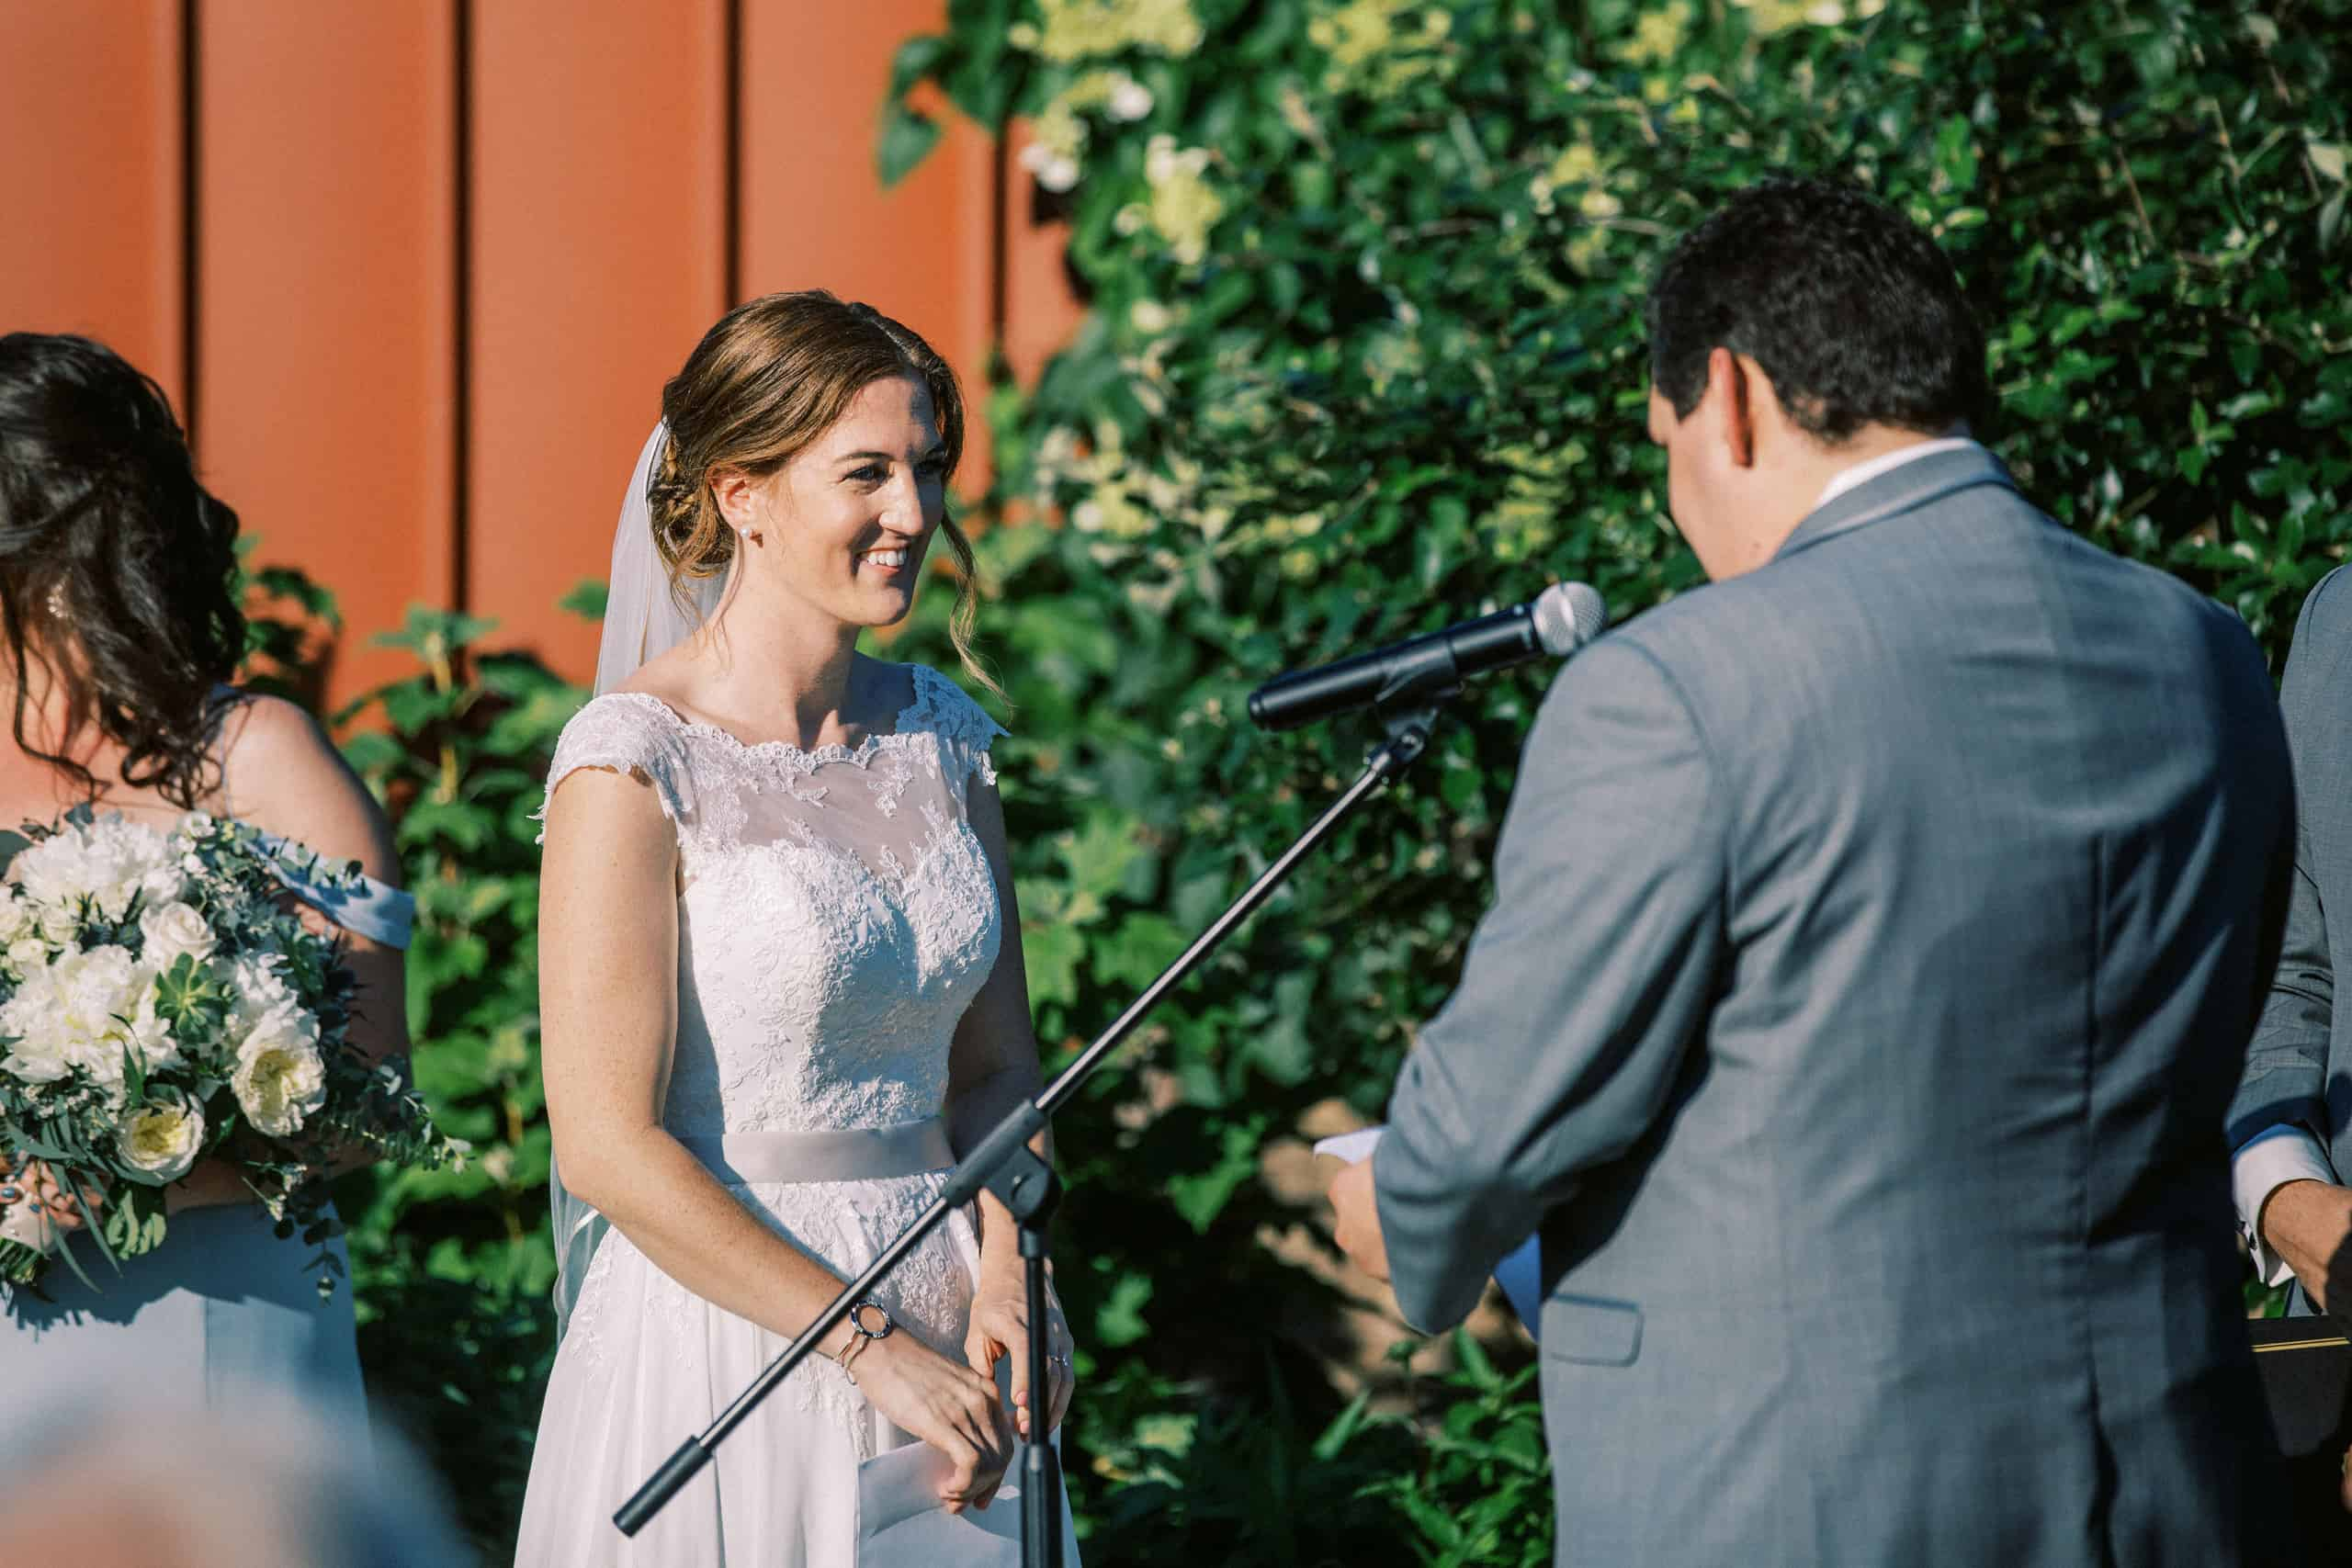 Wedding Ceremony photos Old York Road Country Club